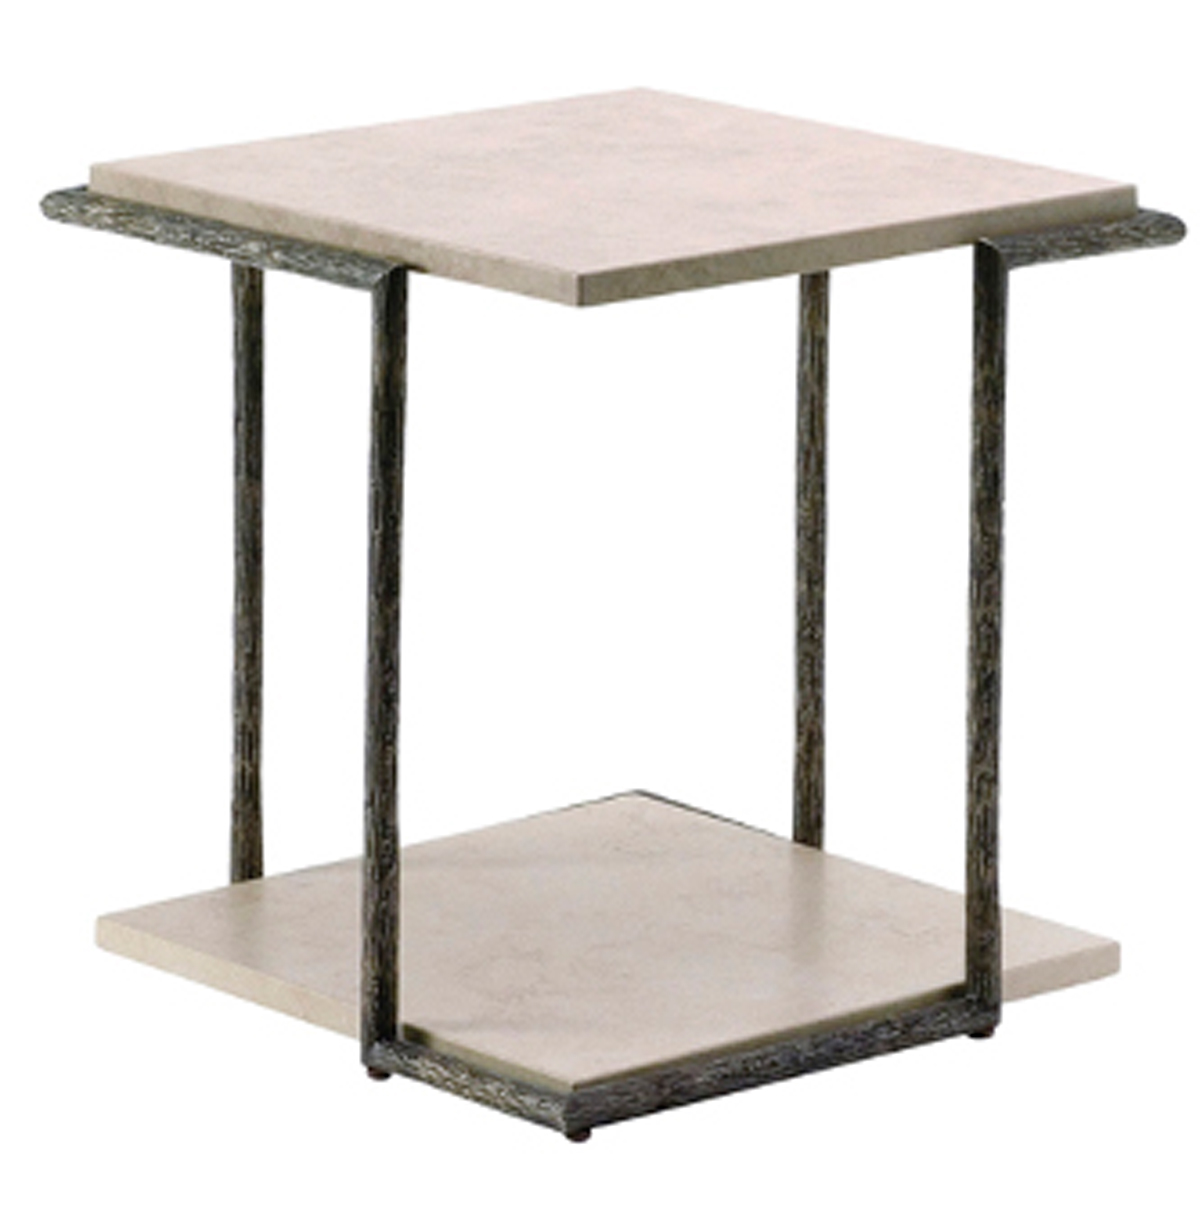 THOMAS PHEASANT TEXTURED BRASS SIDE TABLE No. TB-41S